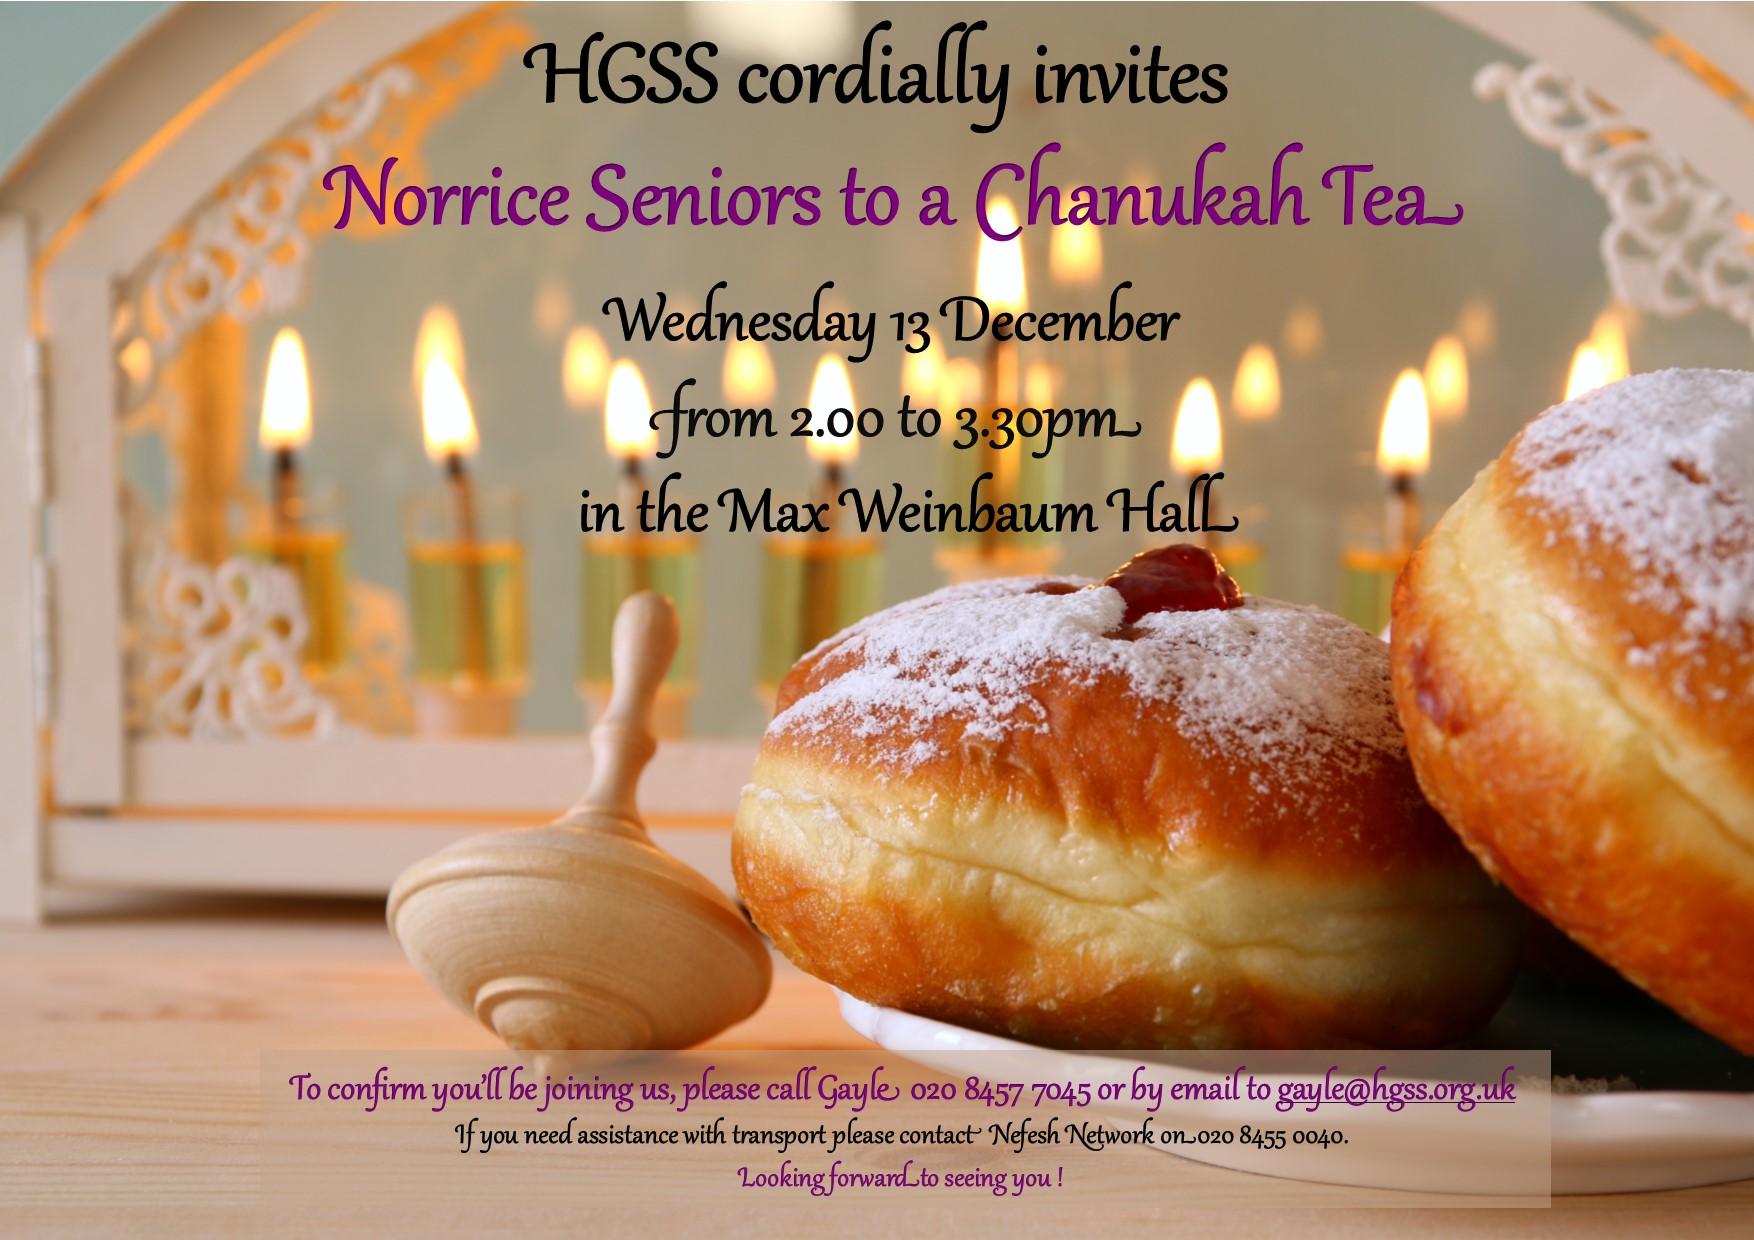 Norrice Seniors Pre Chanukah Tea @ Max Weinbaum Hall